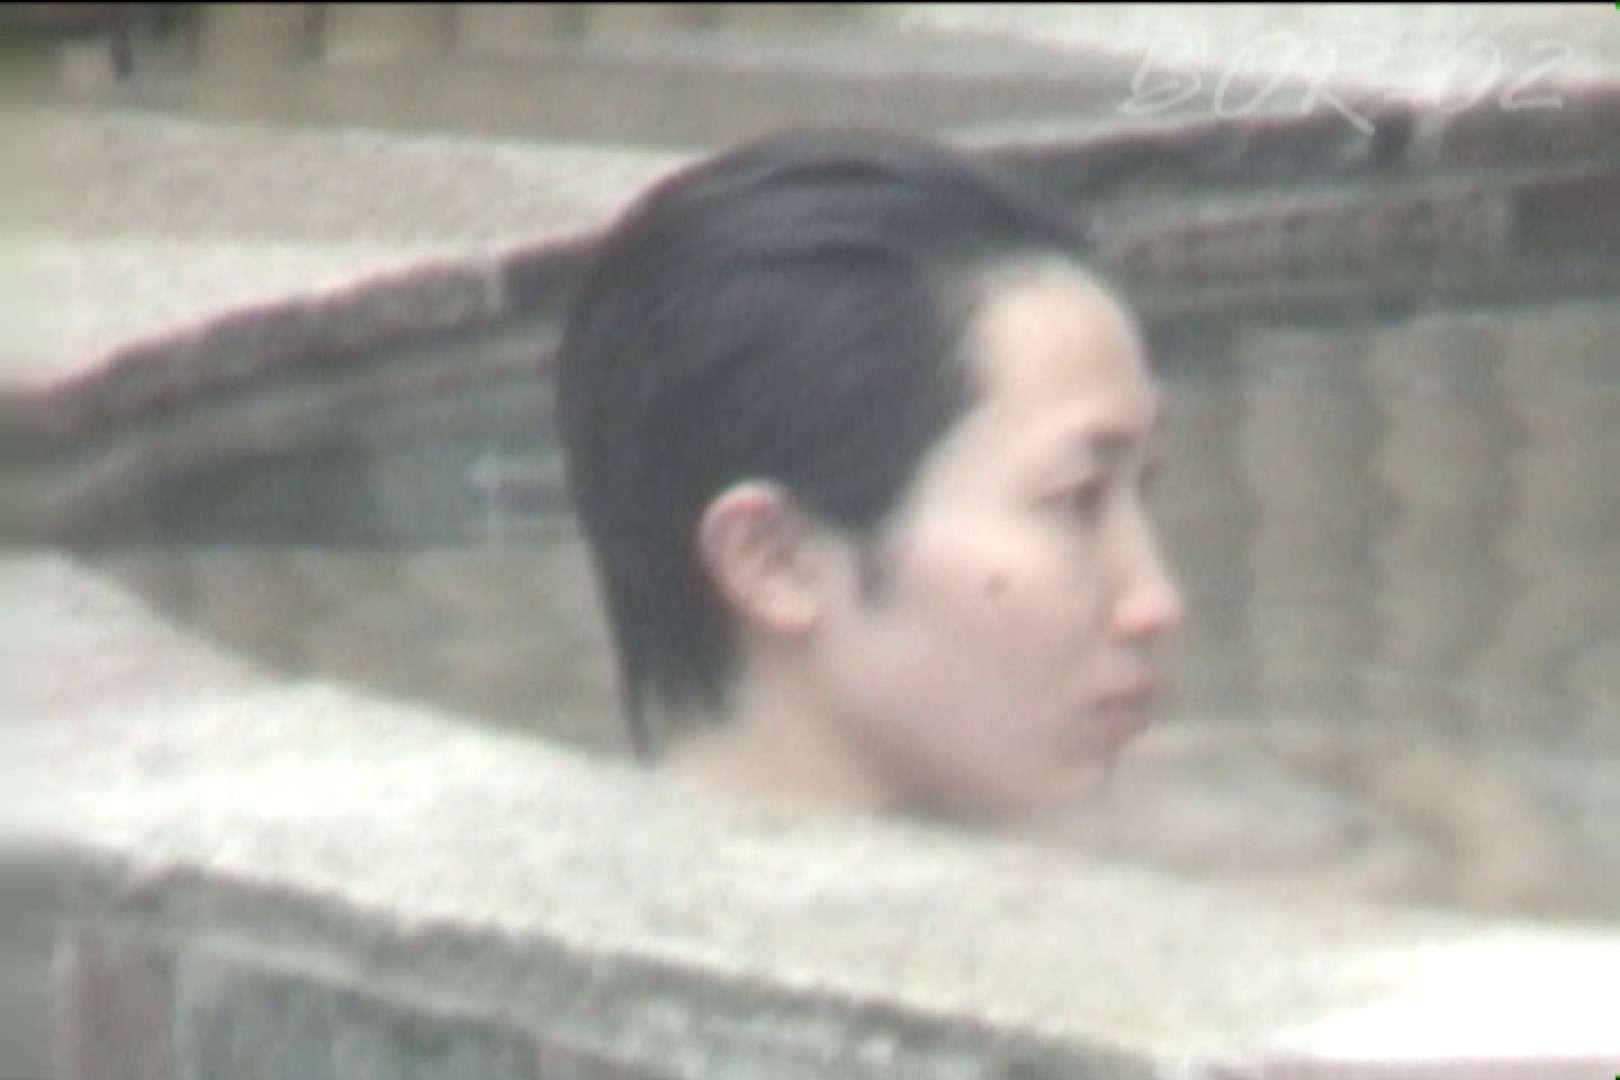 Aquaな露天風呂Vol.472 露天風呂突入 | 盗撮師作品  83pic 22